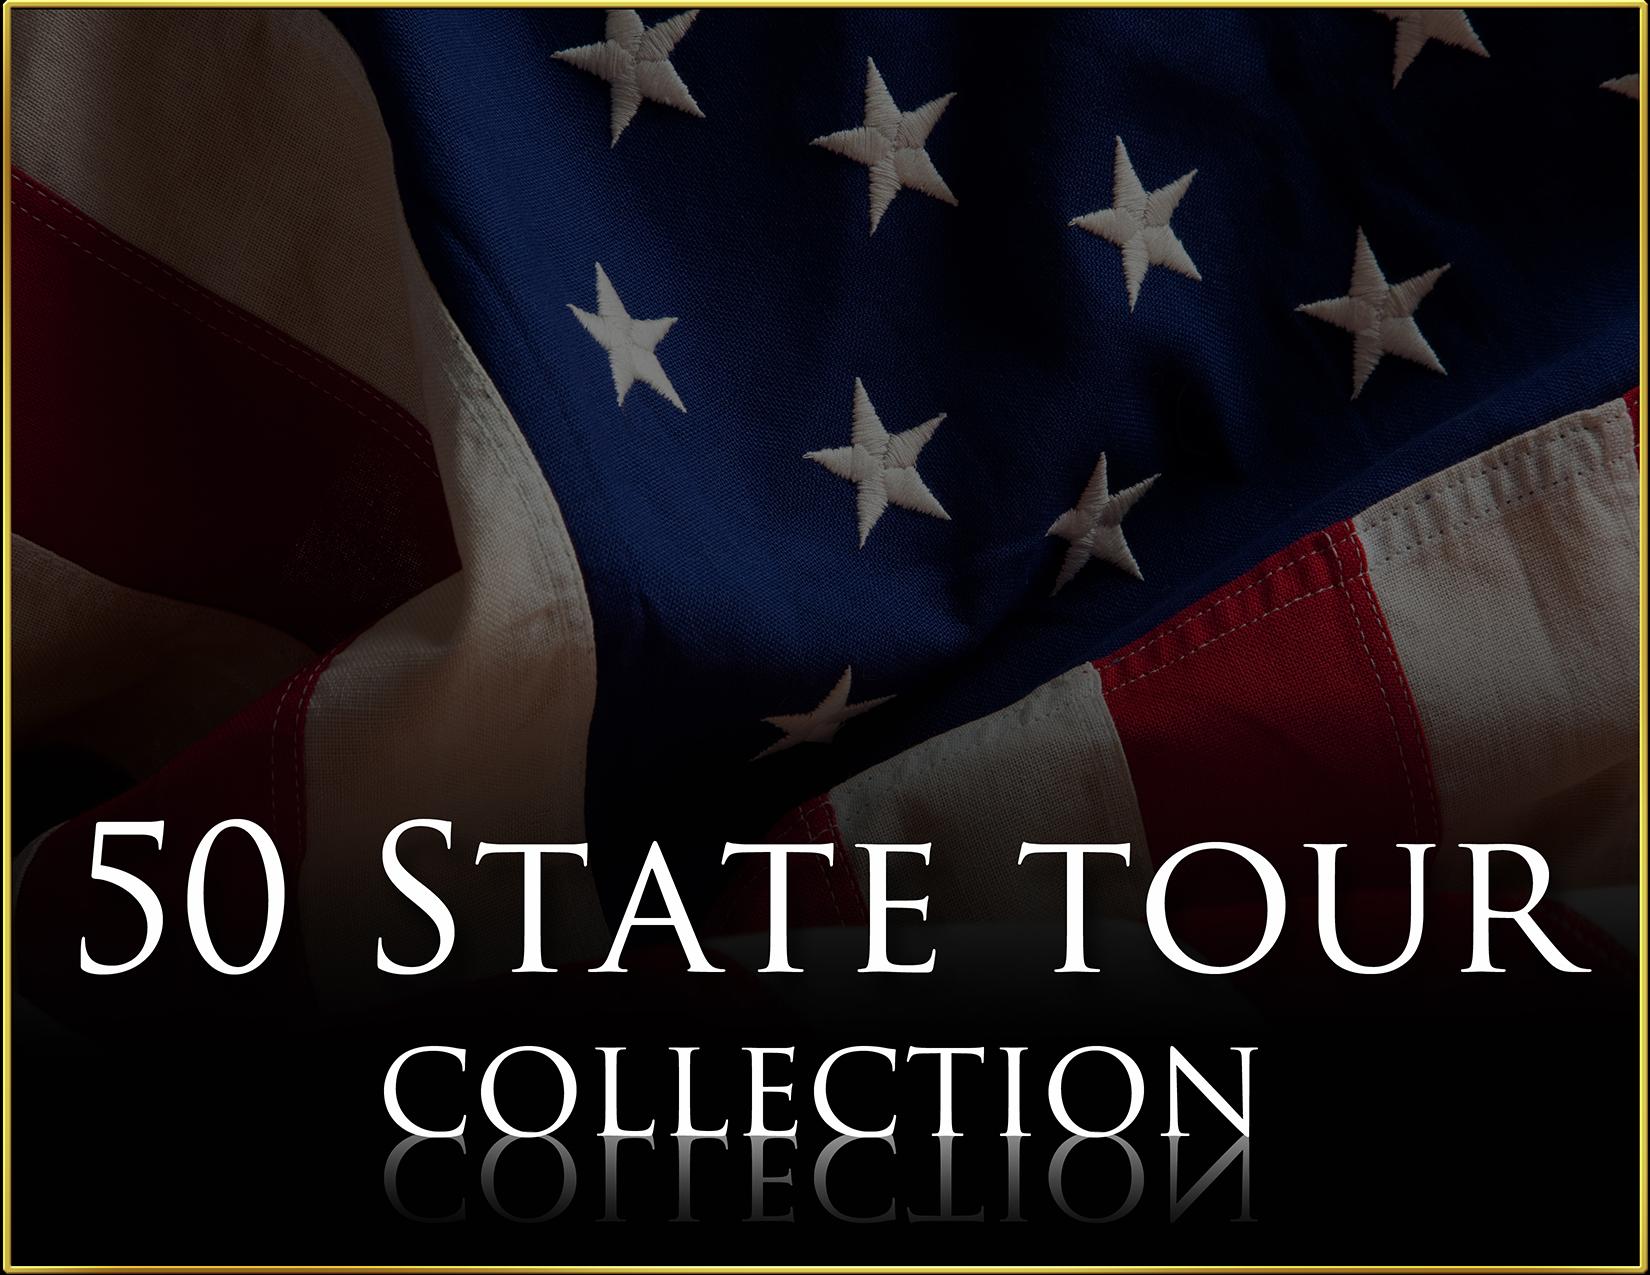 50 St tour copy.jpg